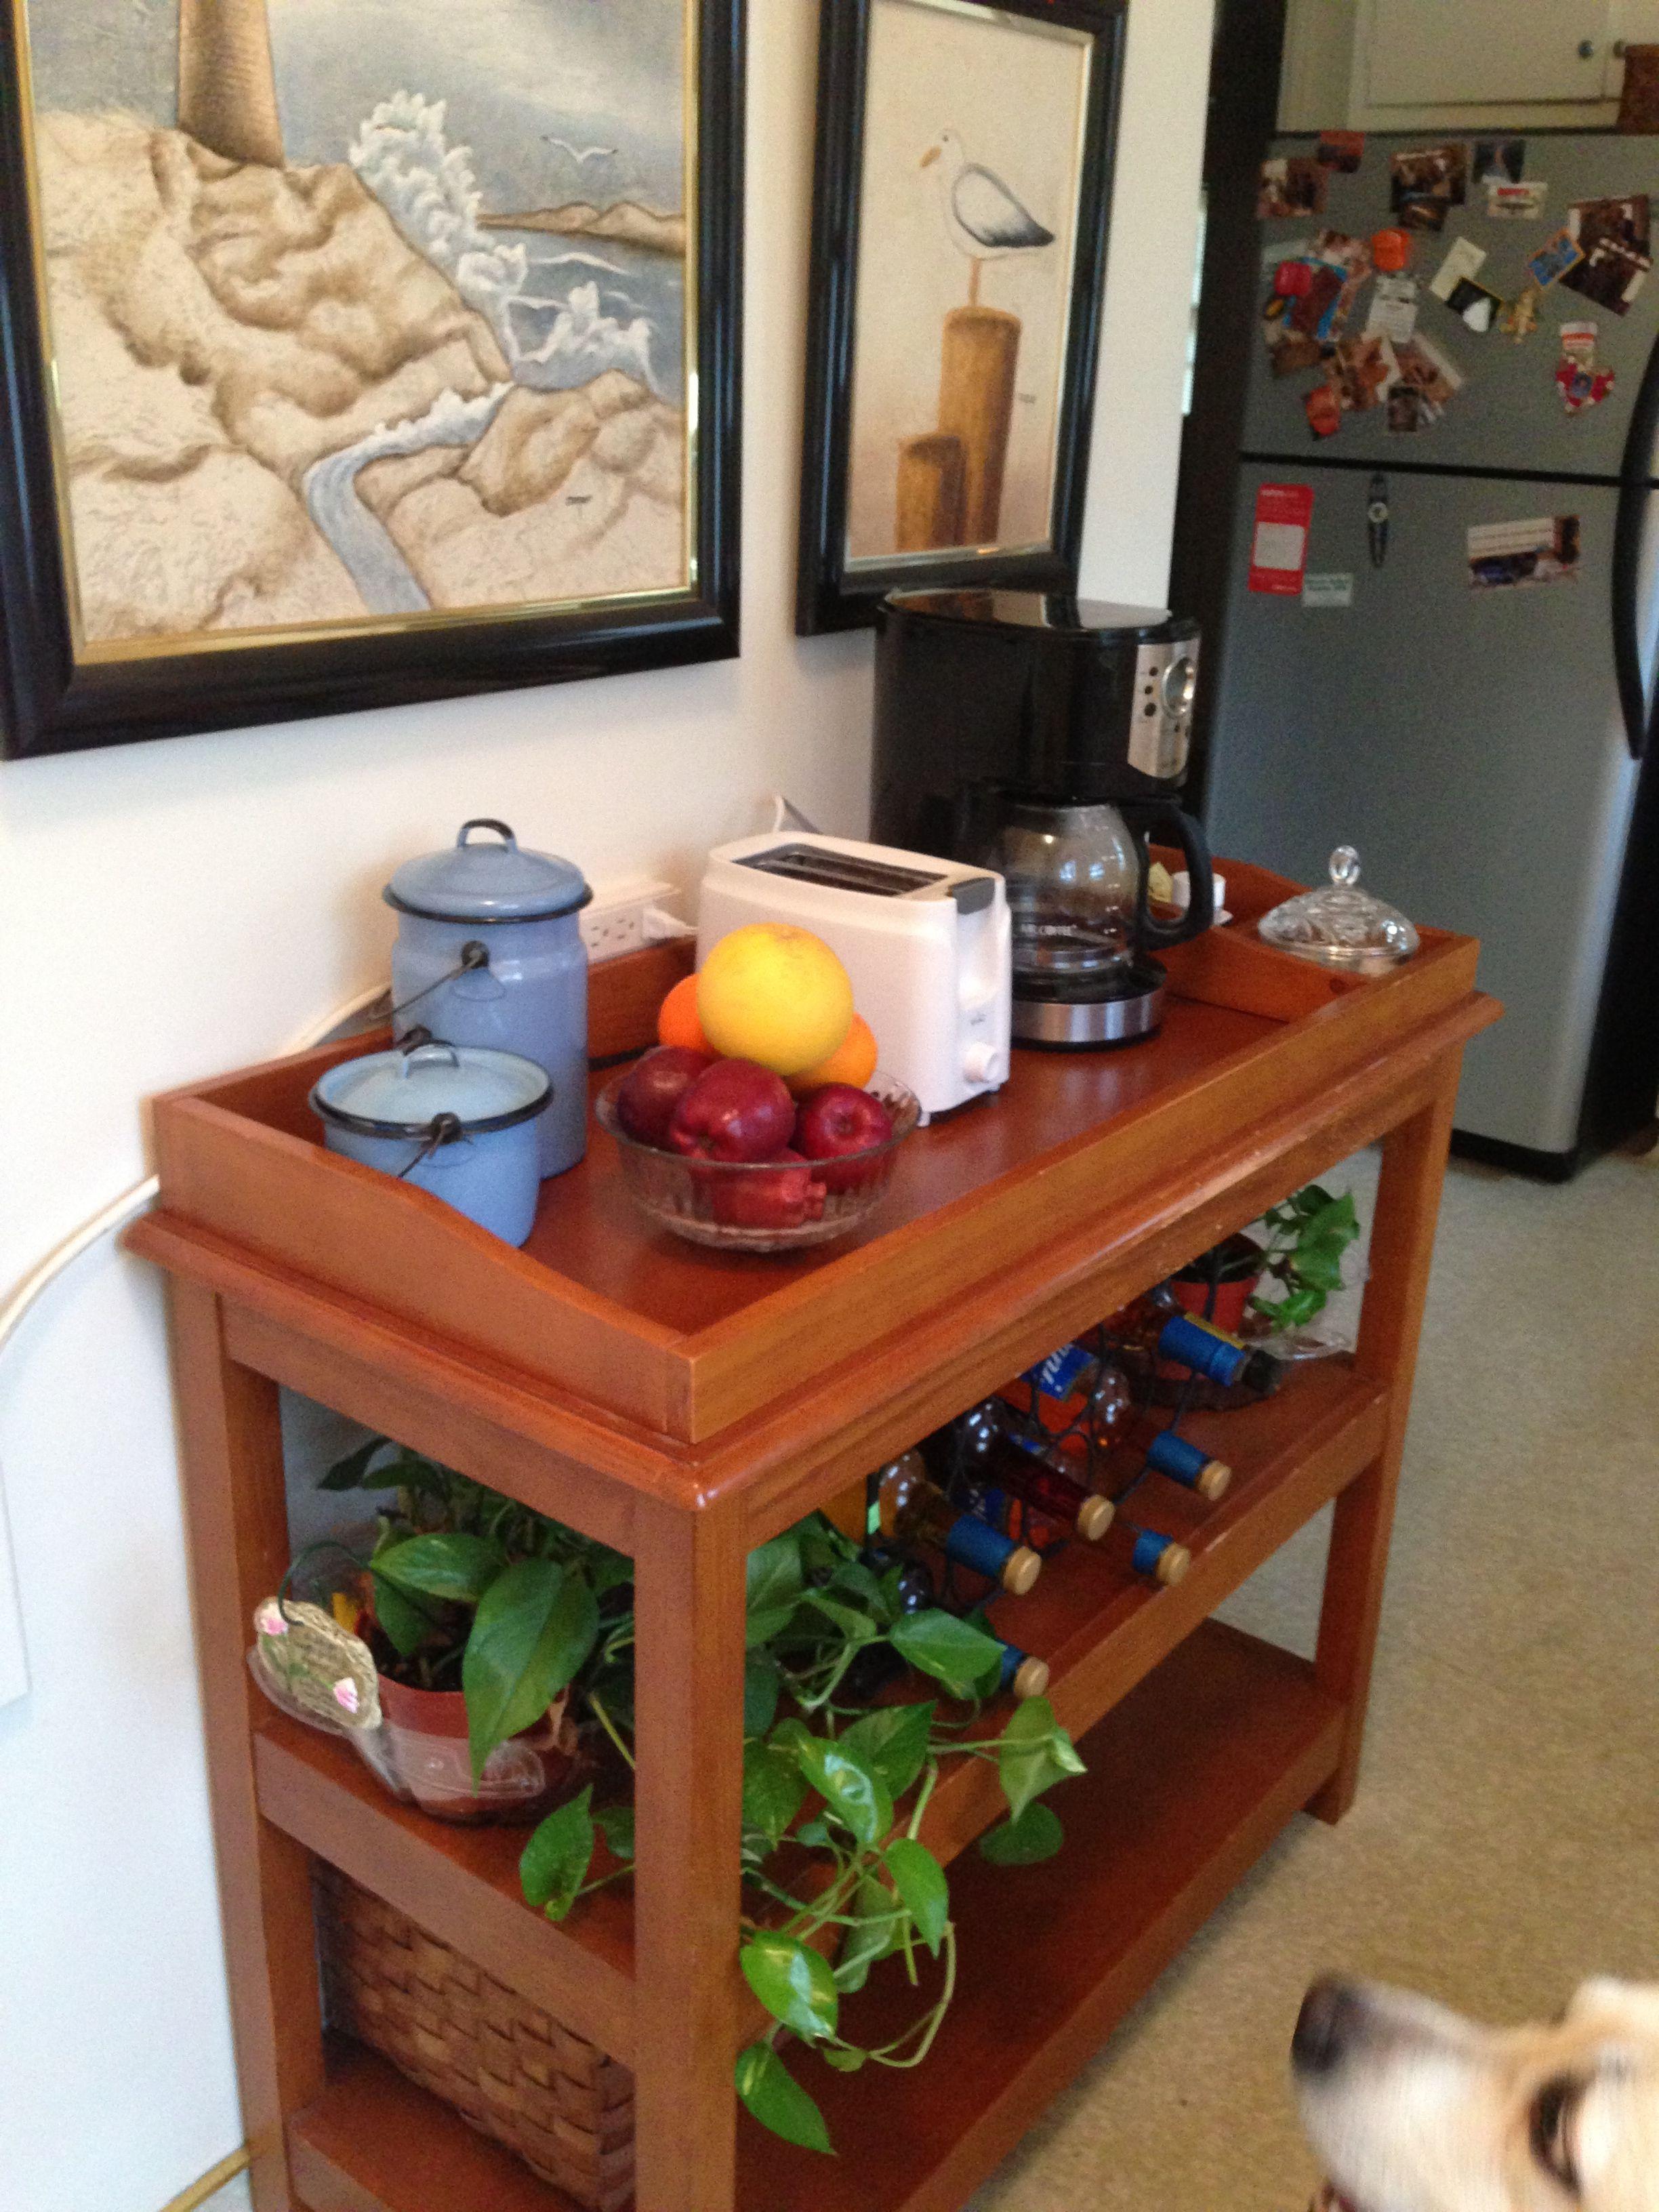 Repurpose Baby Changing Table To Coffee Bar For Kitchen Coffee Bar Home Bar Table Diy Changing Table Repurpose